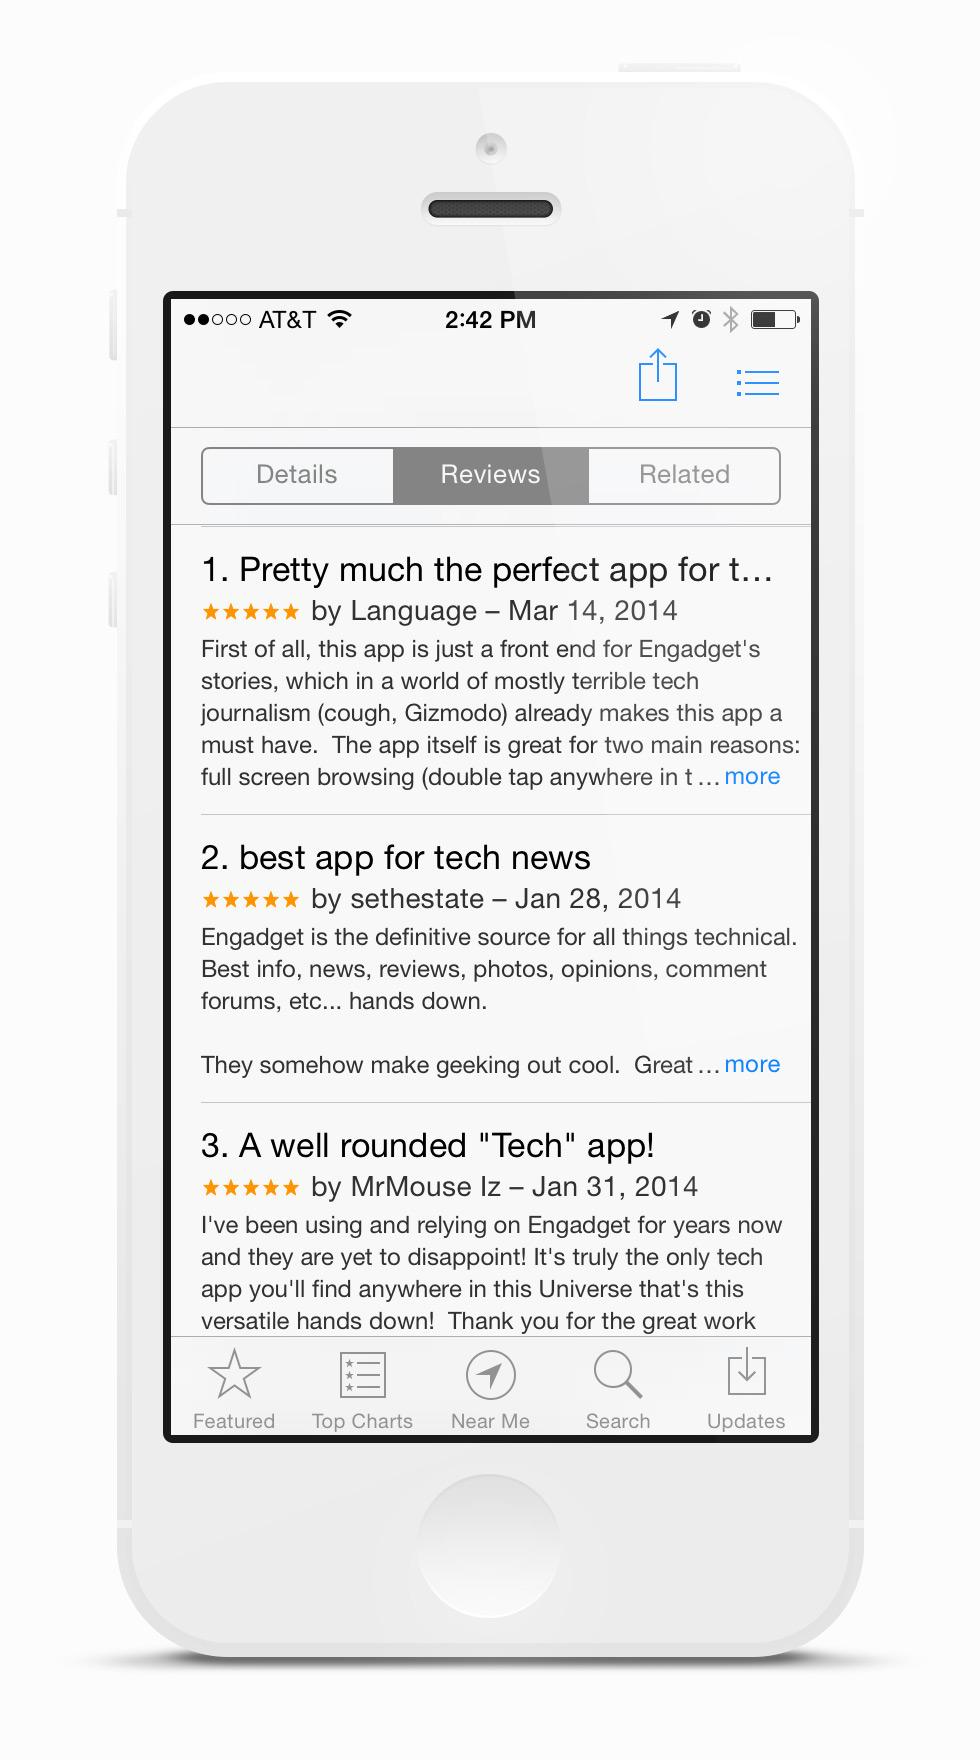 Engadget-iPhone-5-Reviews-01a.jpg